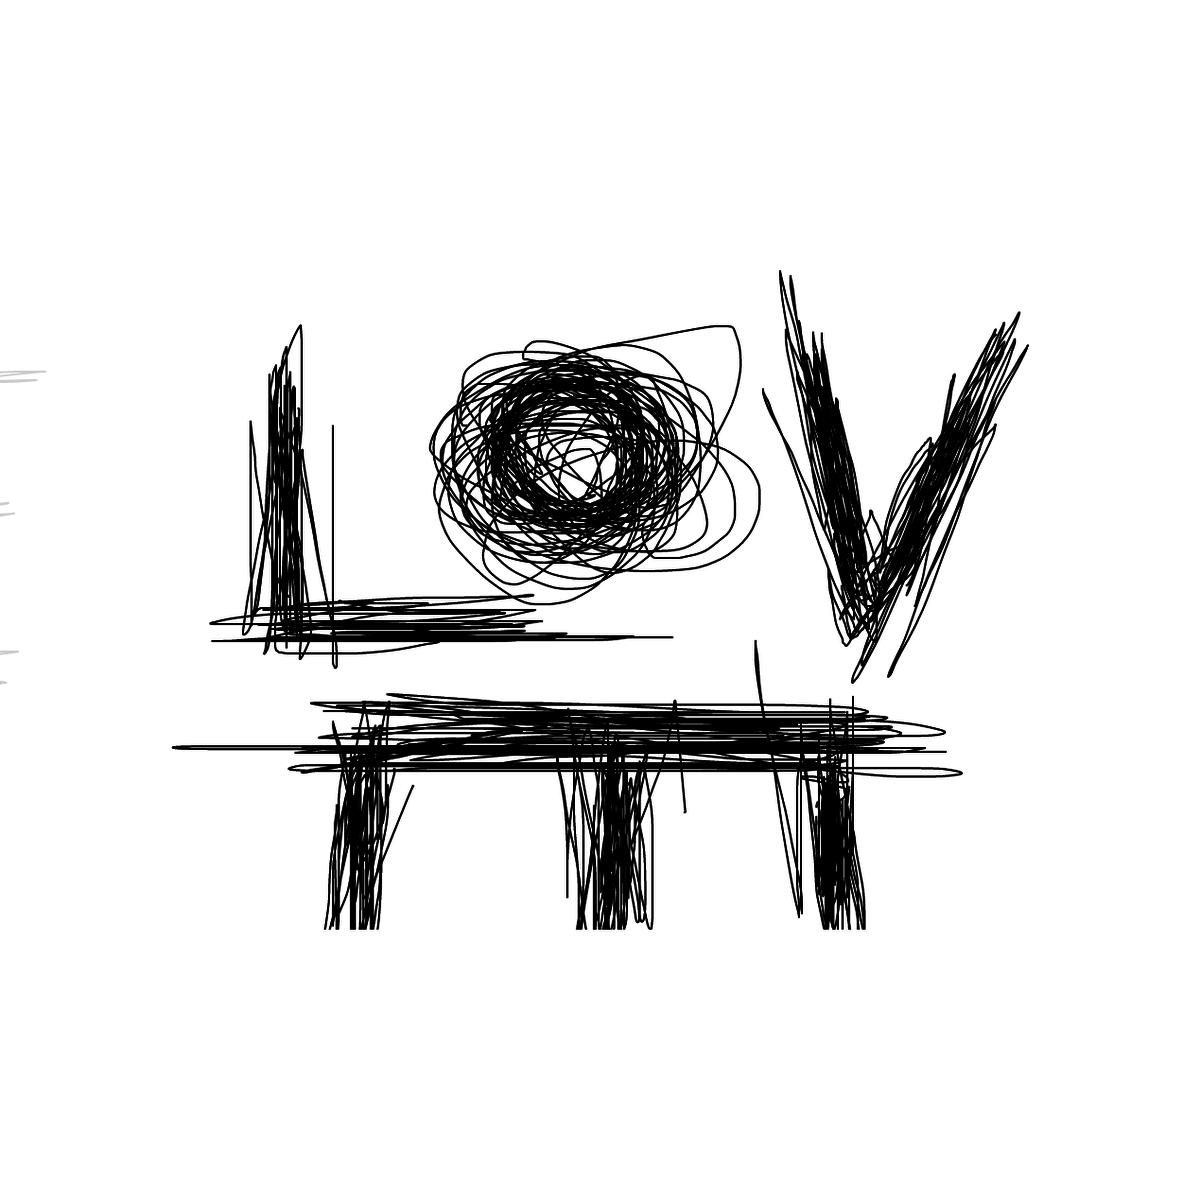 BAAAM drawing#13466 lat:59.2589111328125000lng: 10.4664449691772460